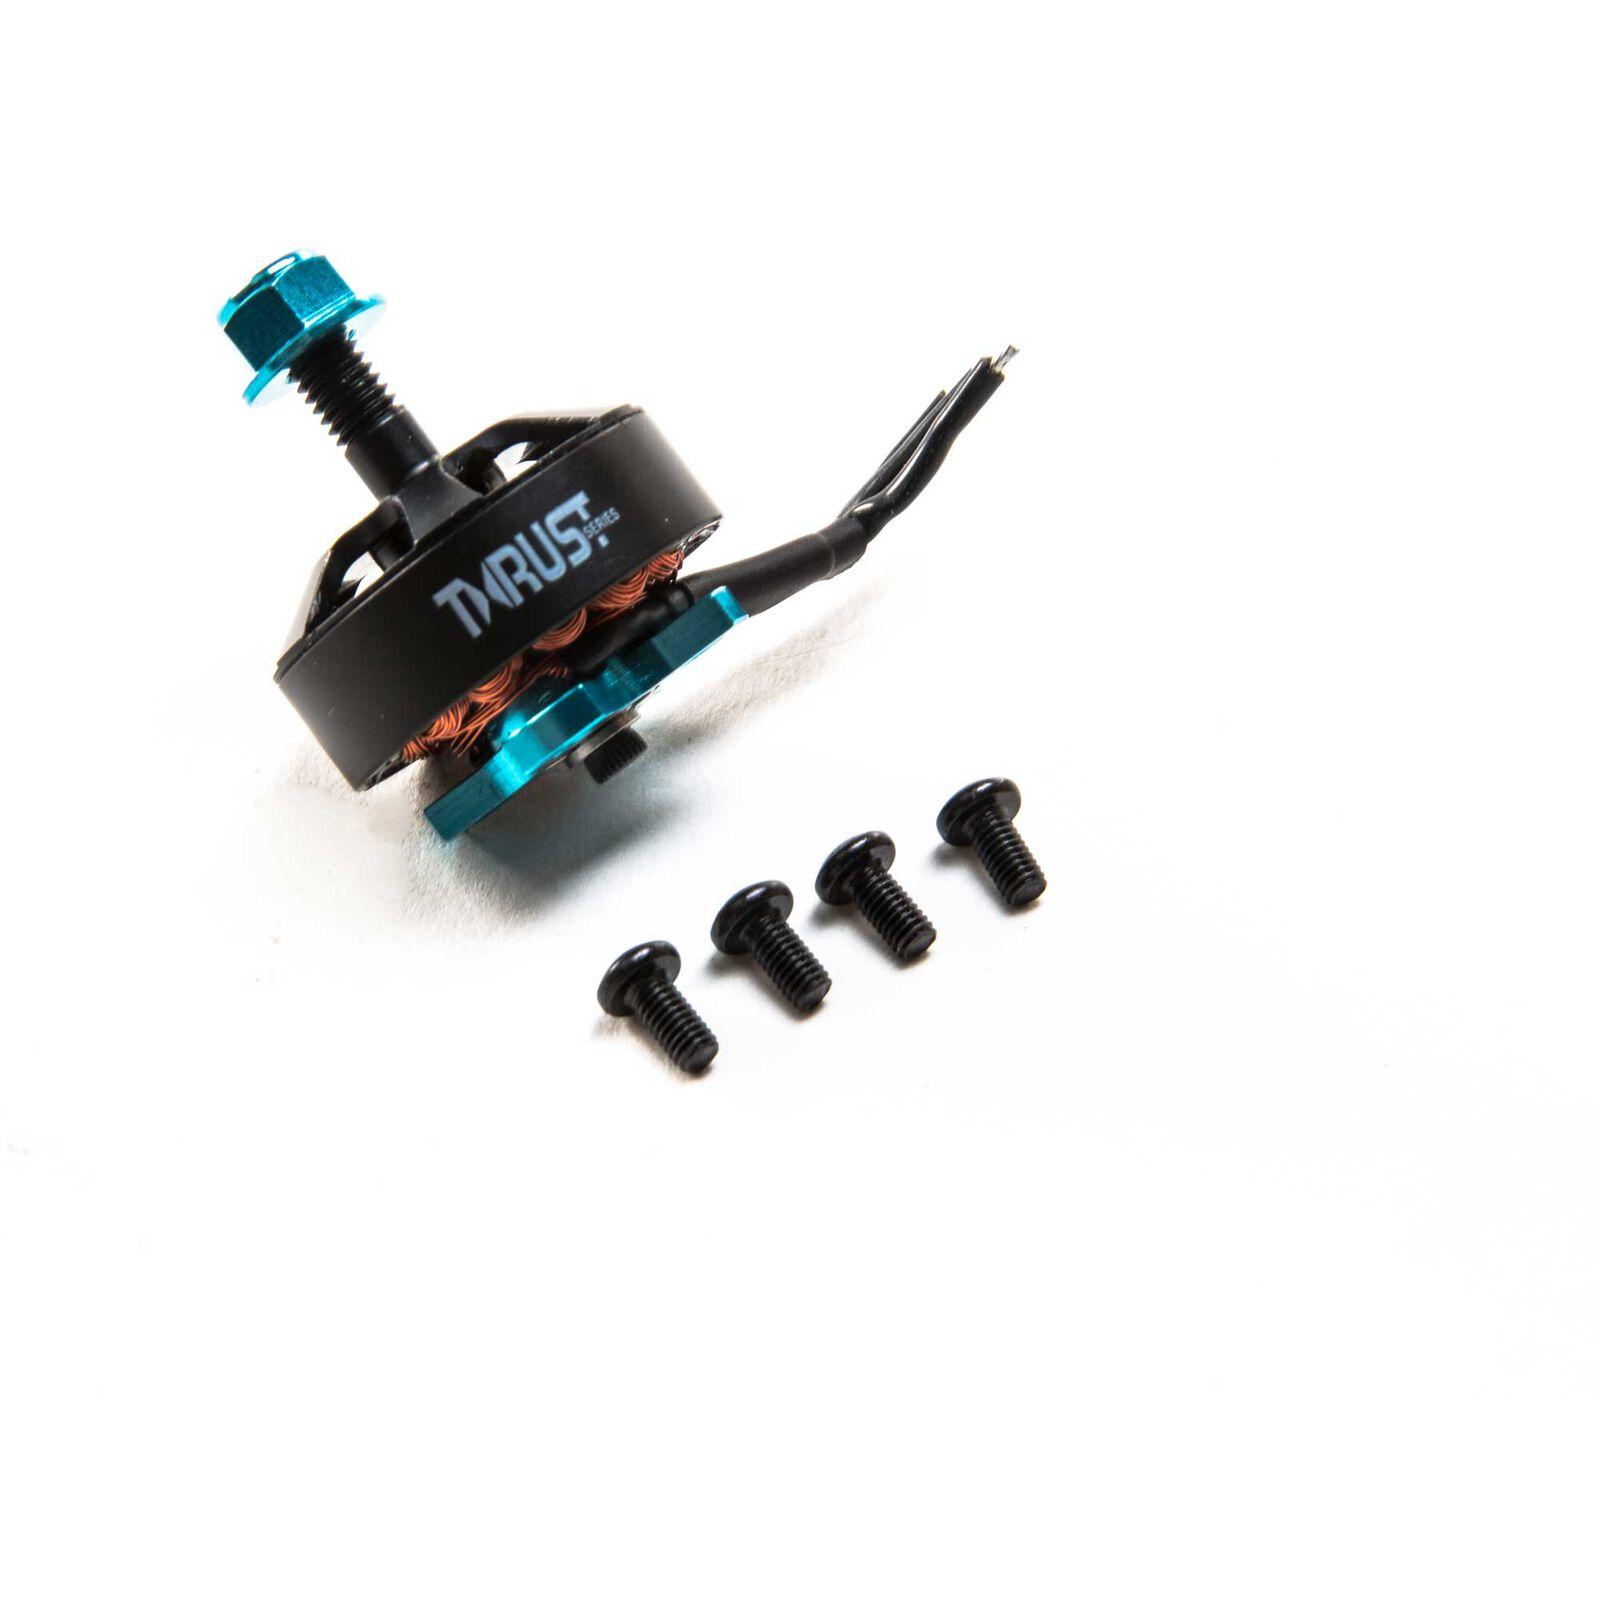 2206-2450Kv FPV Racing Motor, Blue